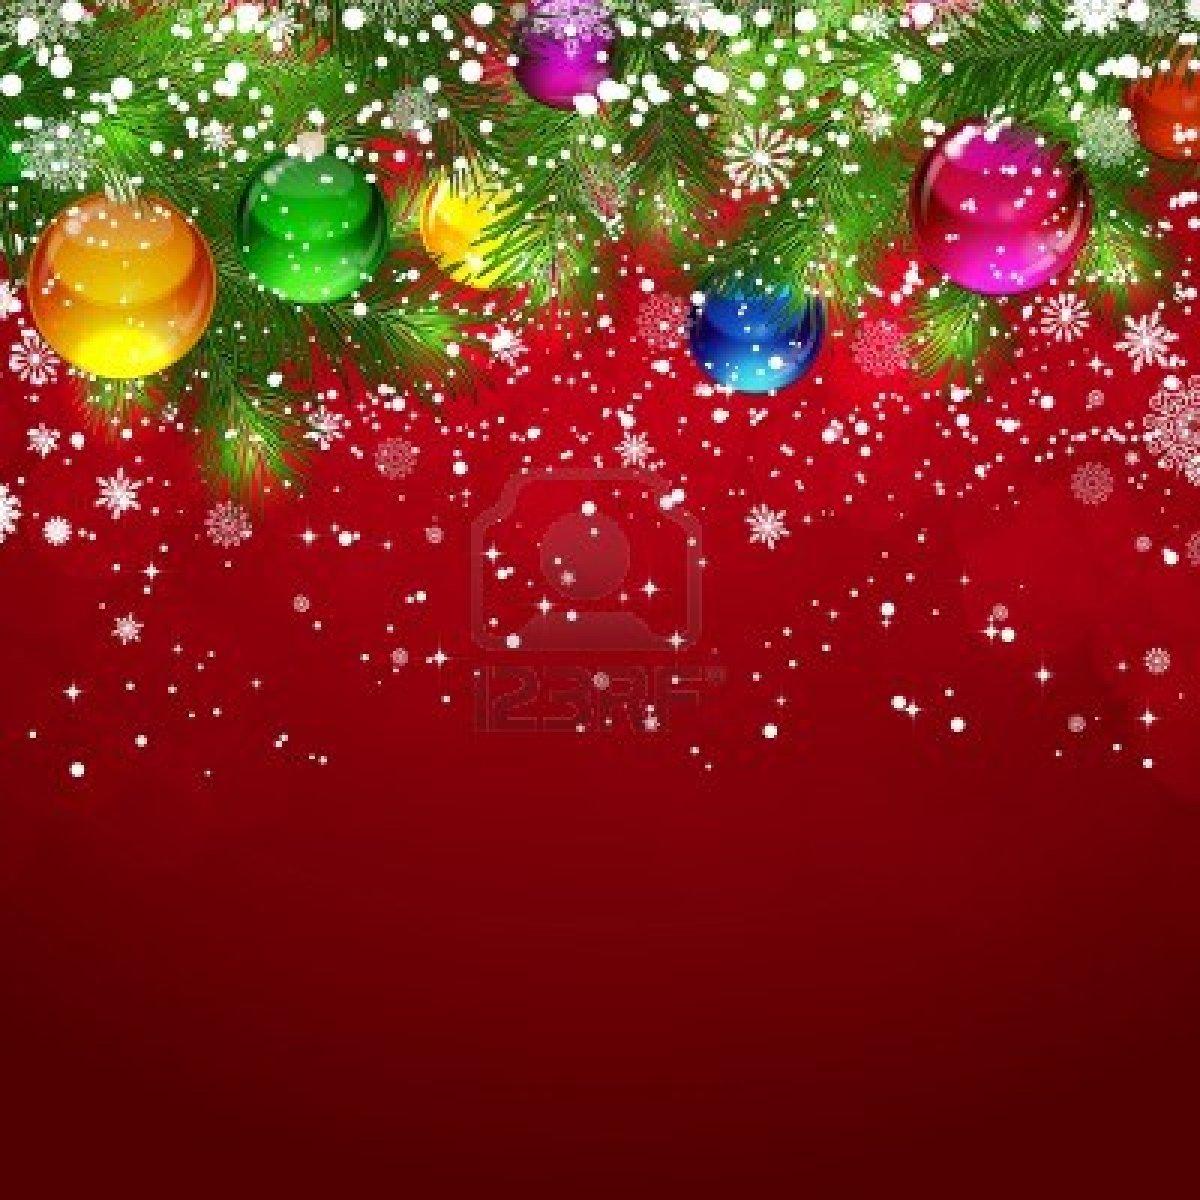 Christmas Wallpaper Clipart